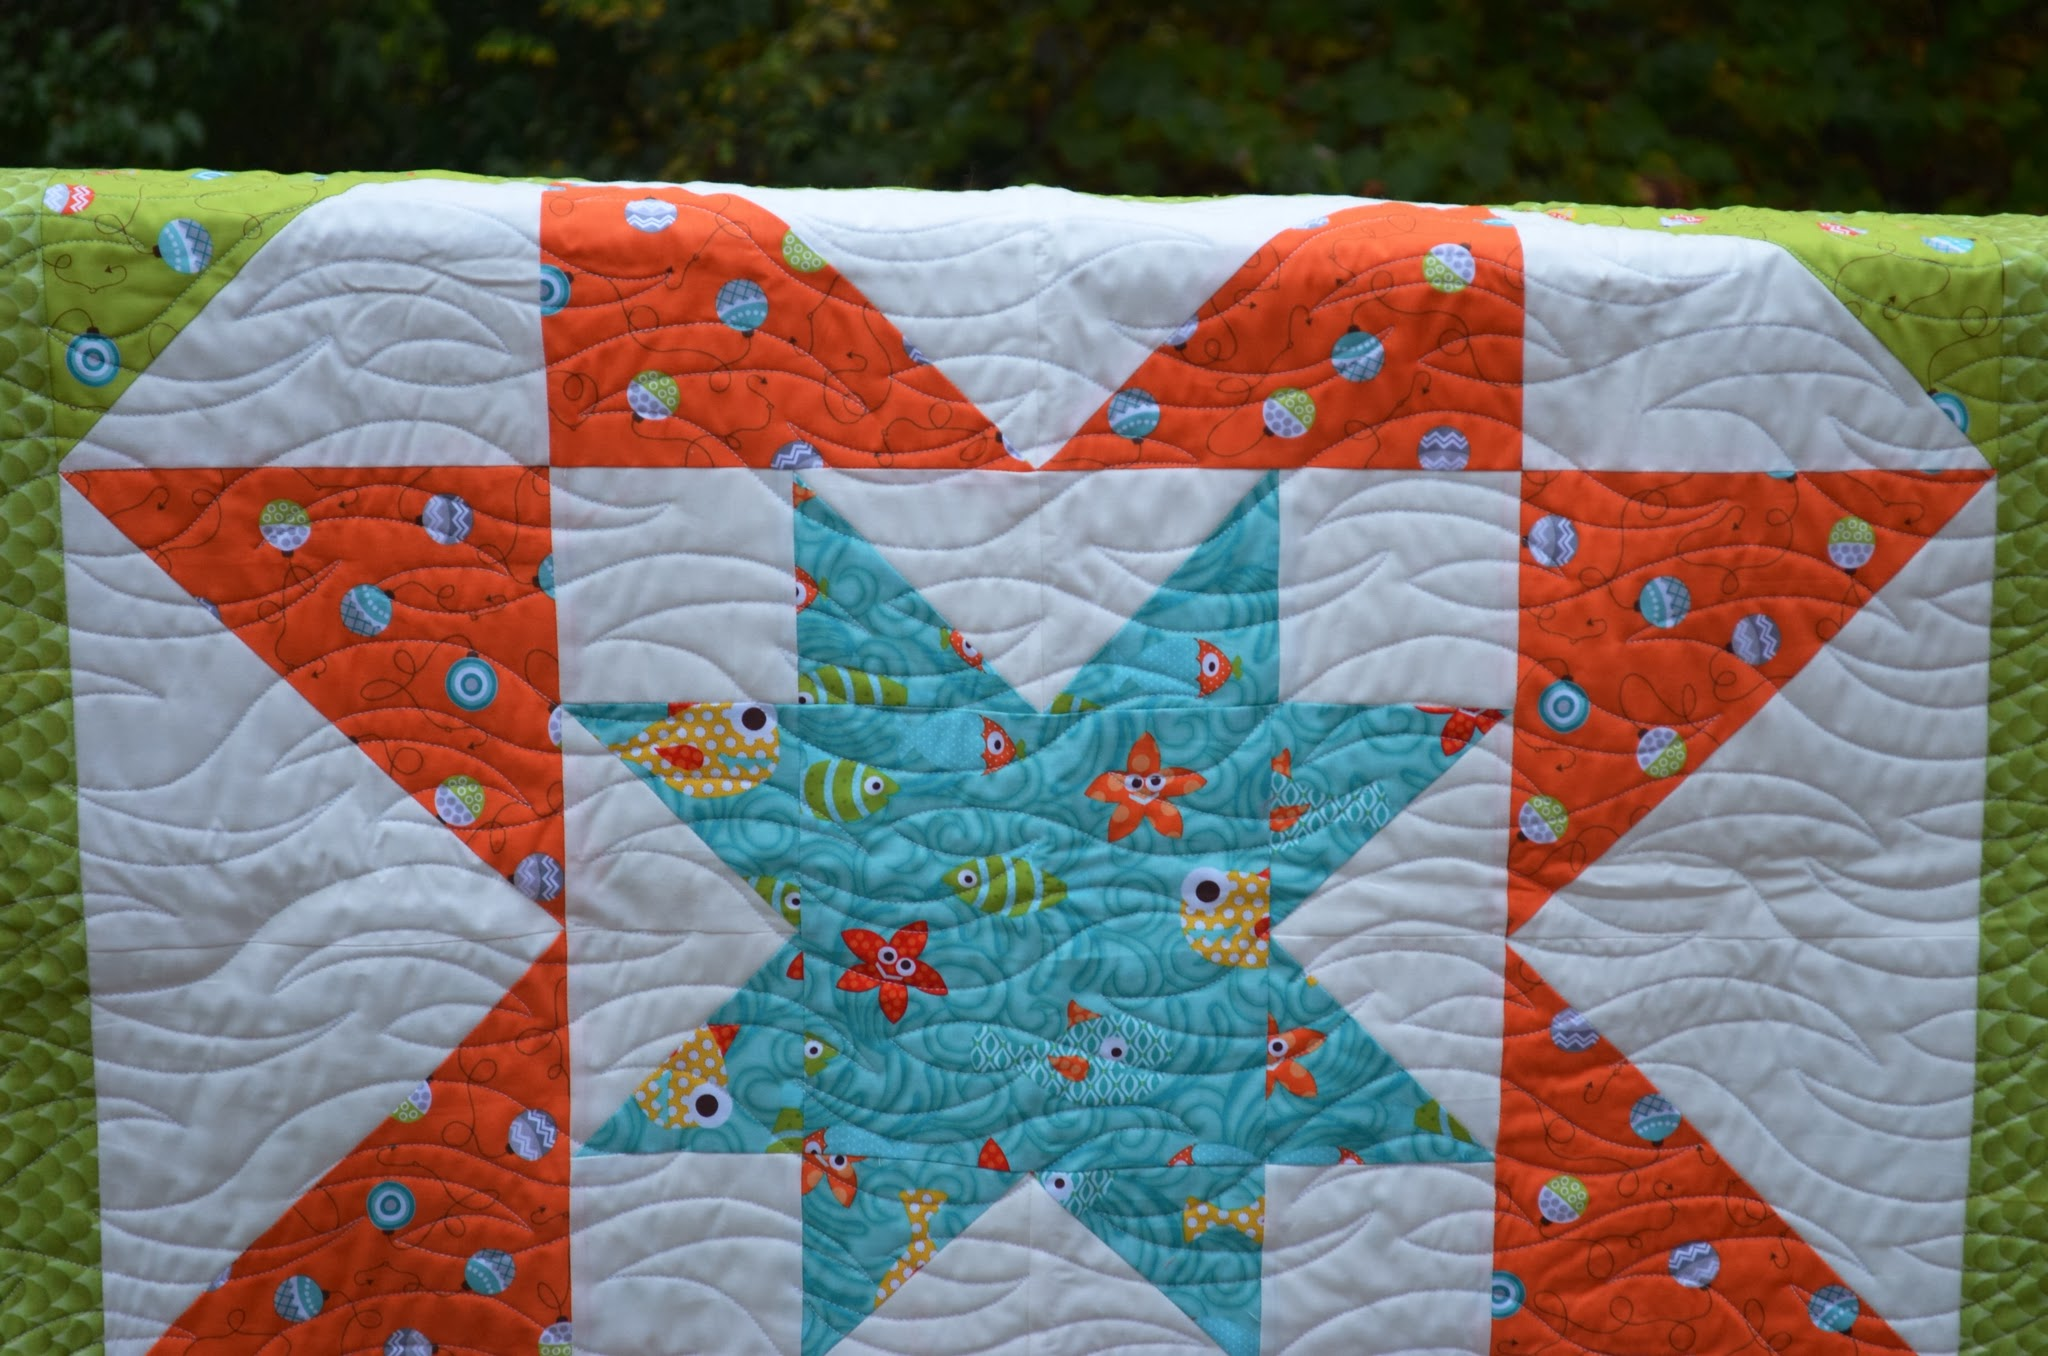 Around the Blocks: Baby Star Quilt